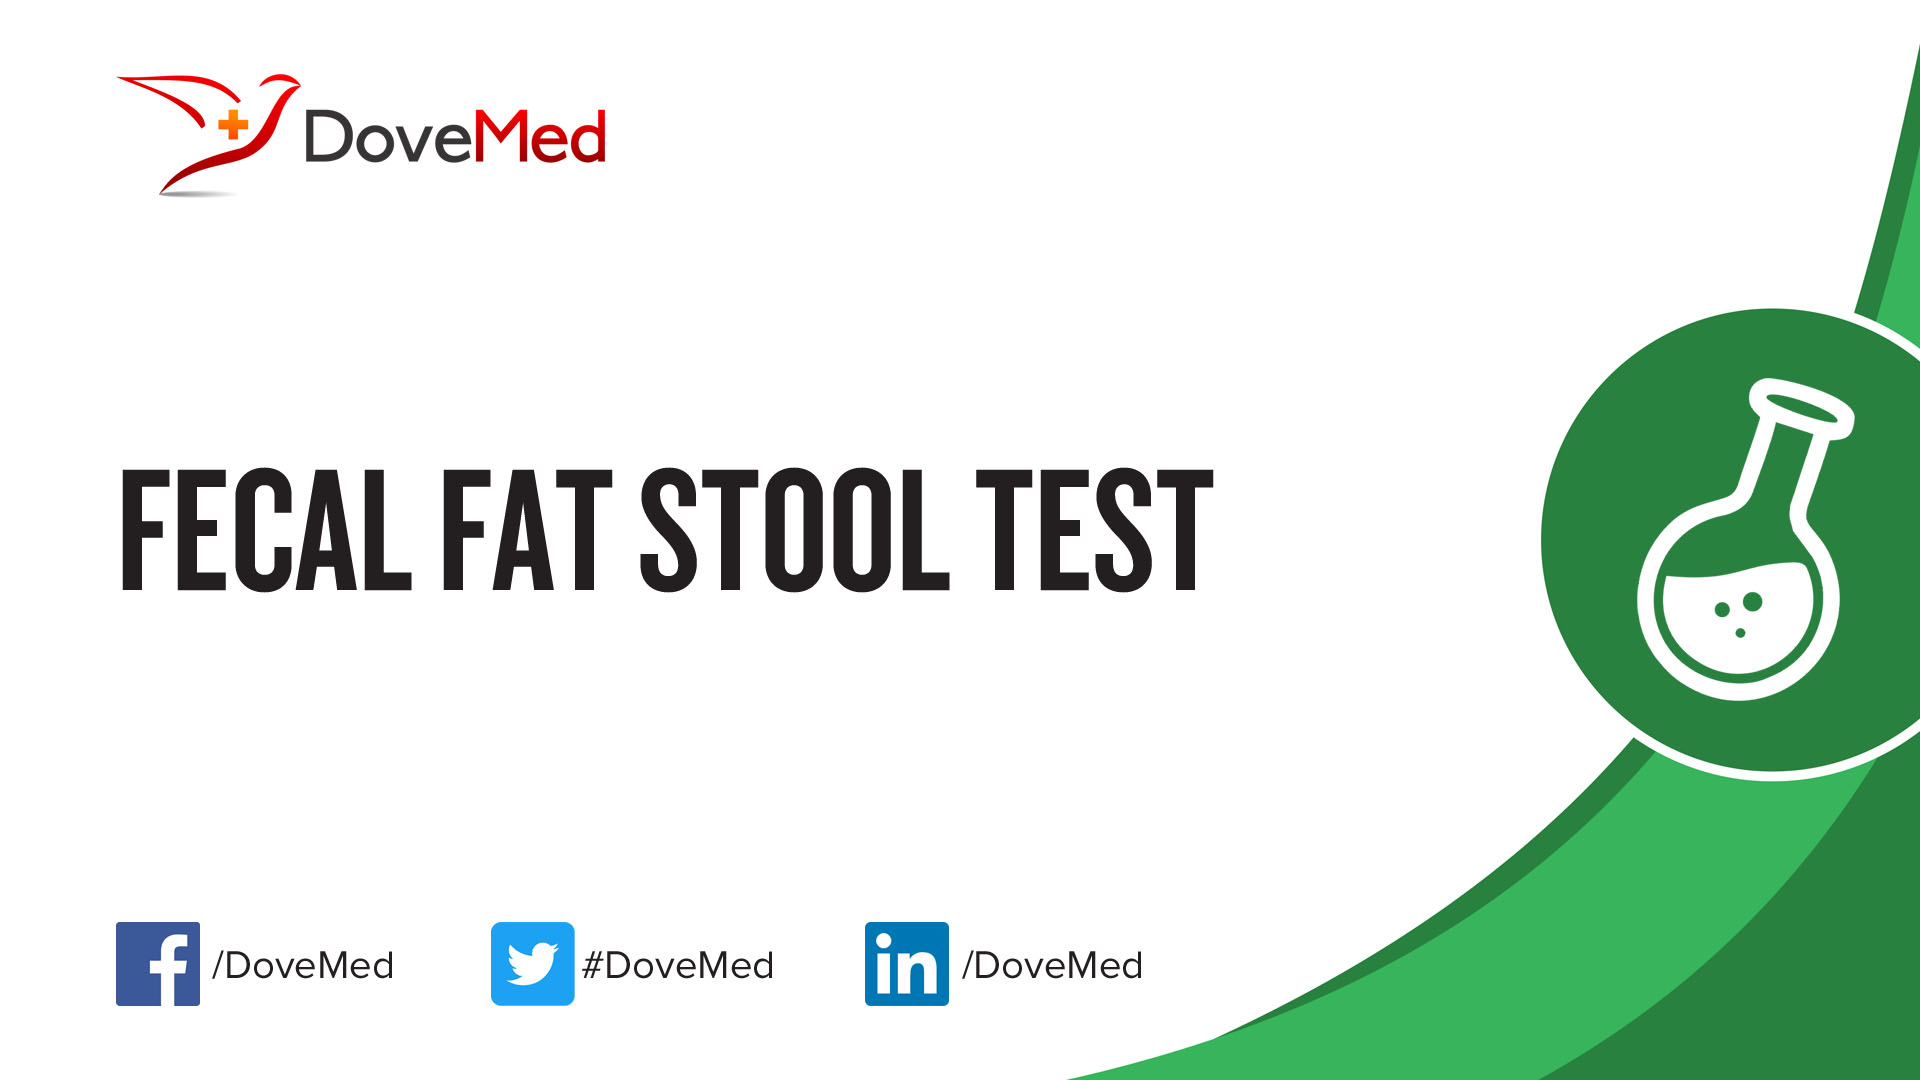 Fecal Fat Stool Test